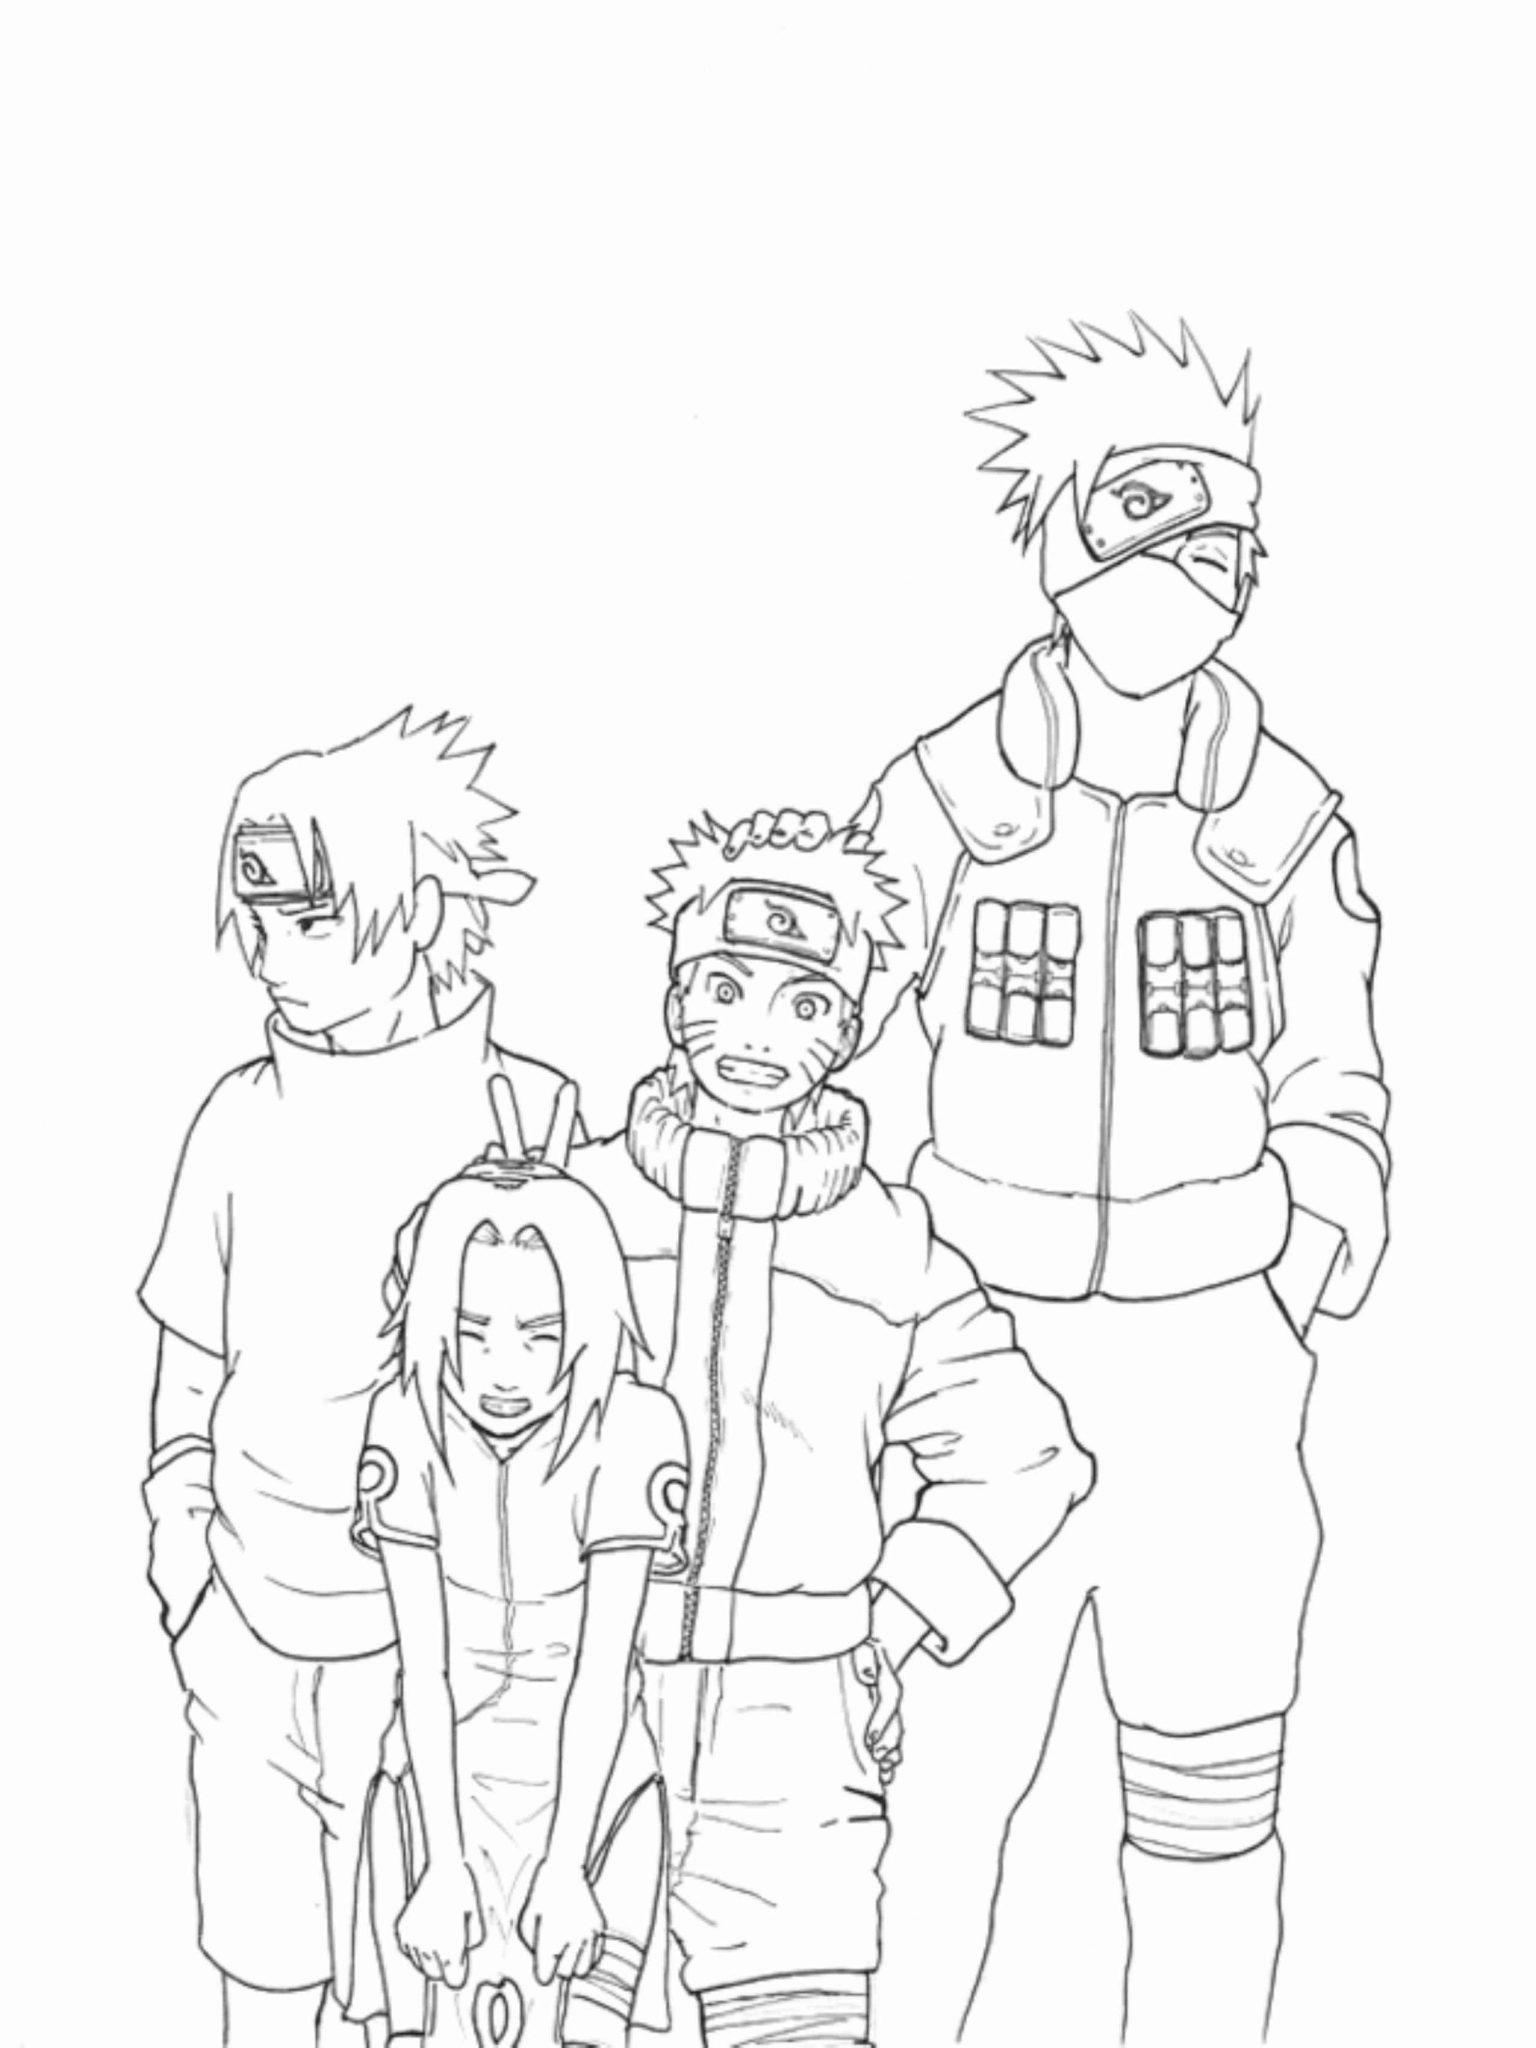 Anime Naruto Coloring Pages Kakashi And Naruto Coloring Pages